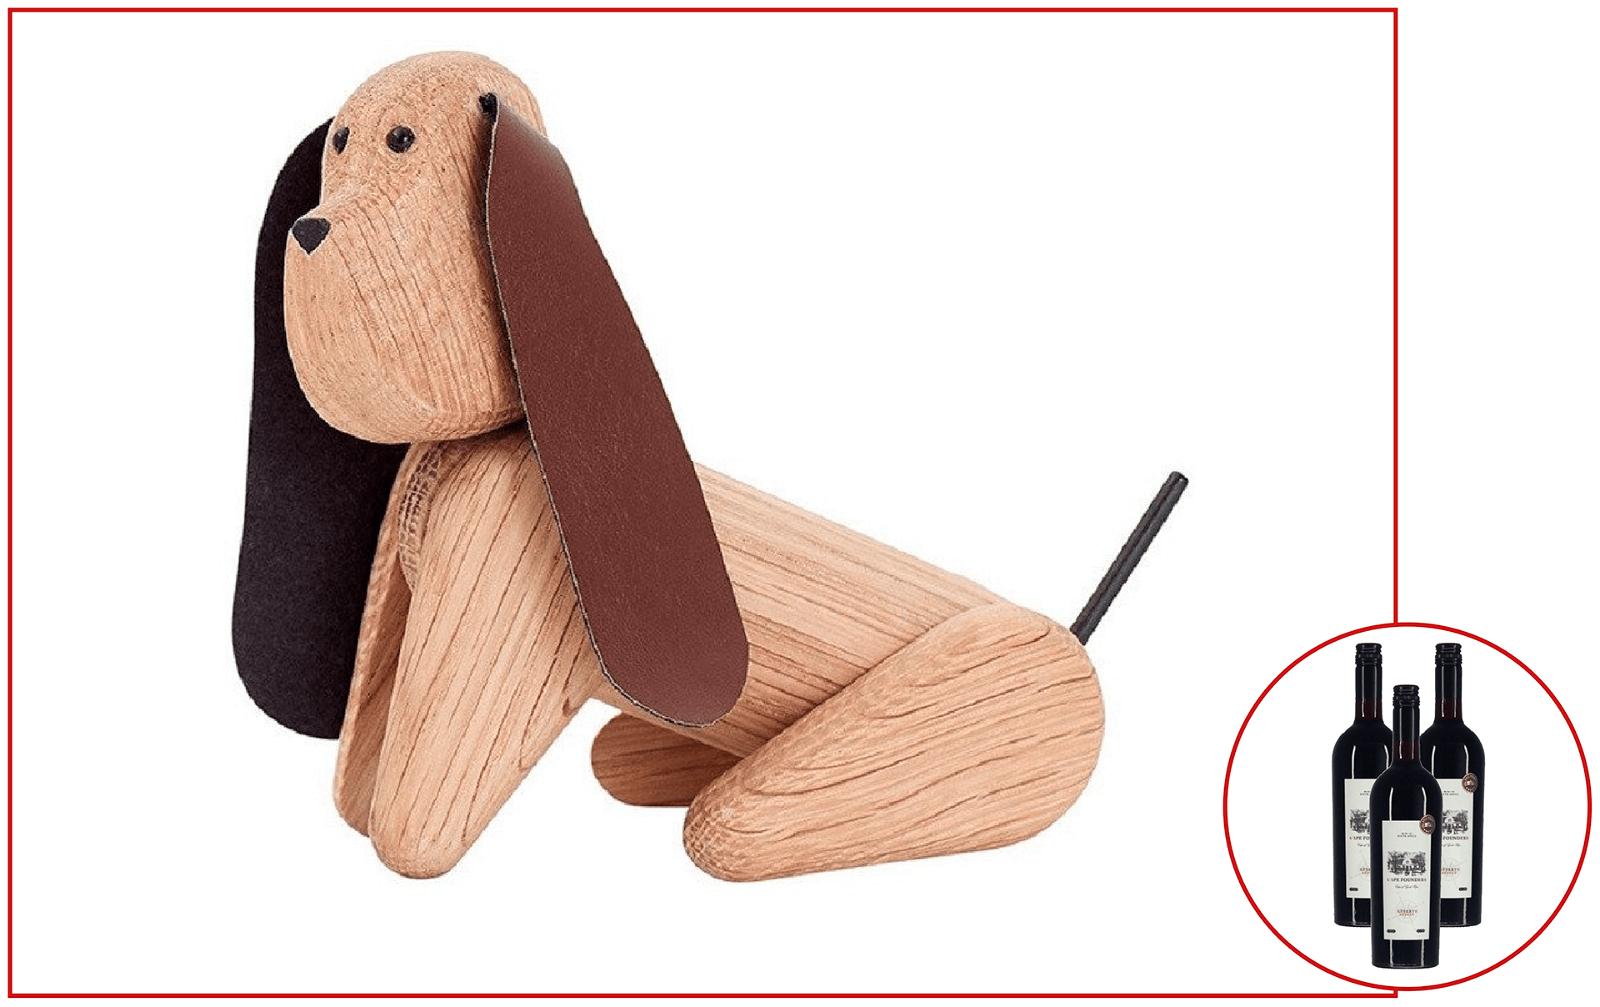 Andersen Furniture Hund + 3 fl. vin